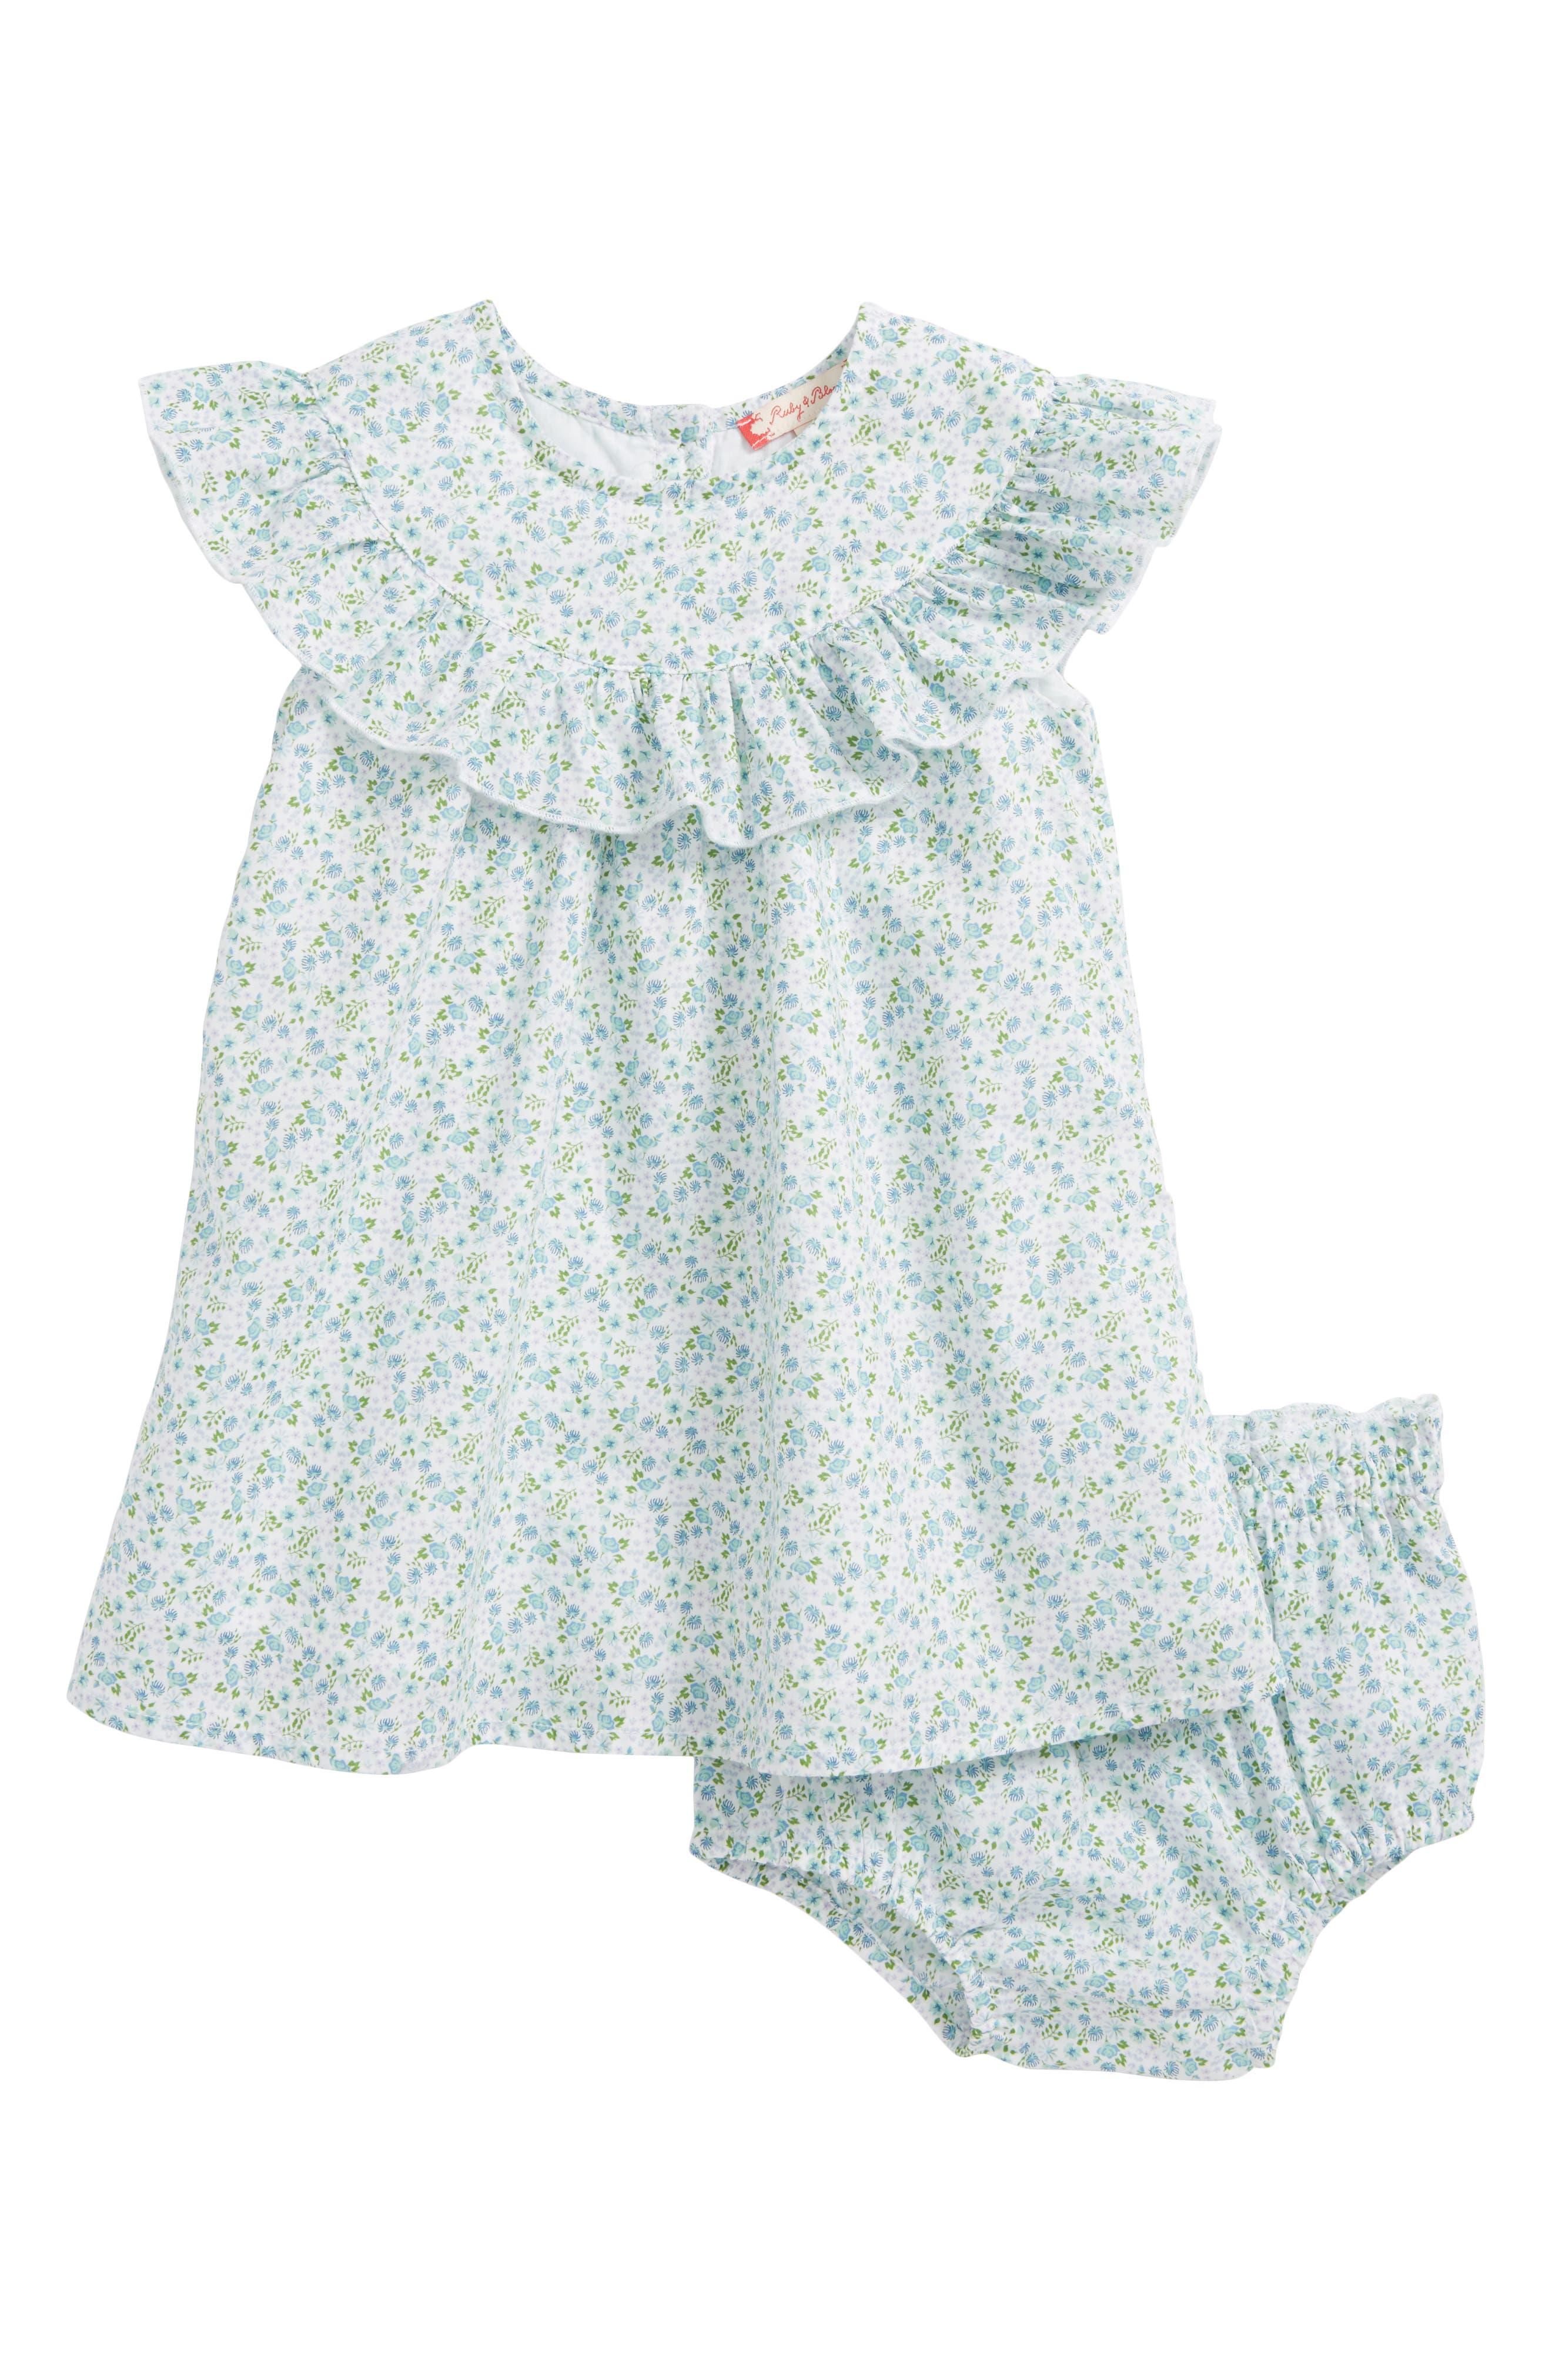 Ruffle Dress,                         Main,                         color, White- Blue Tropic Ditsy